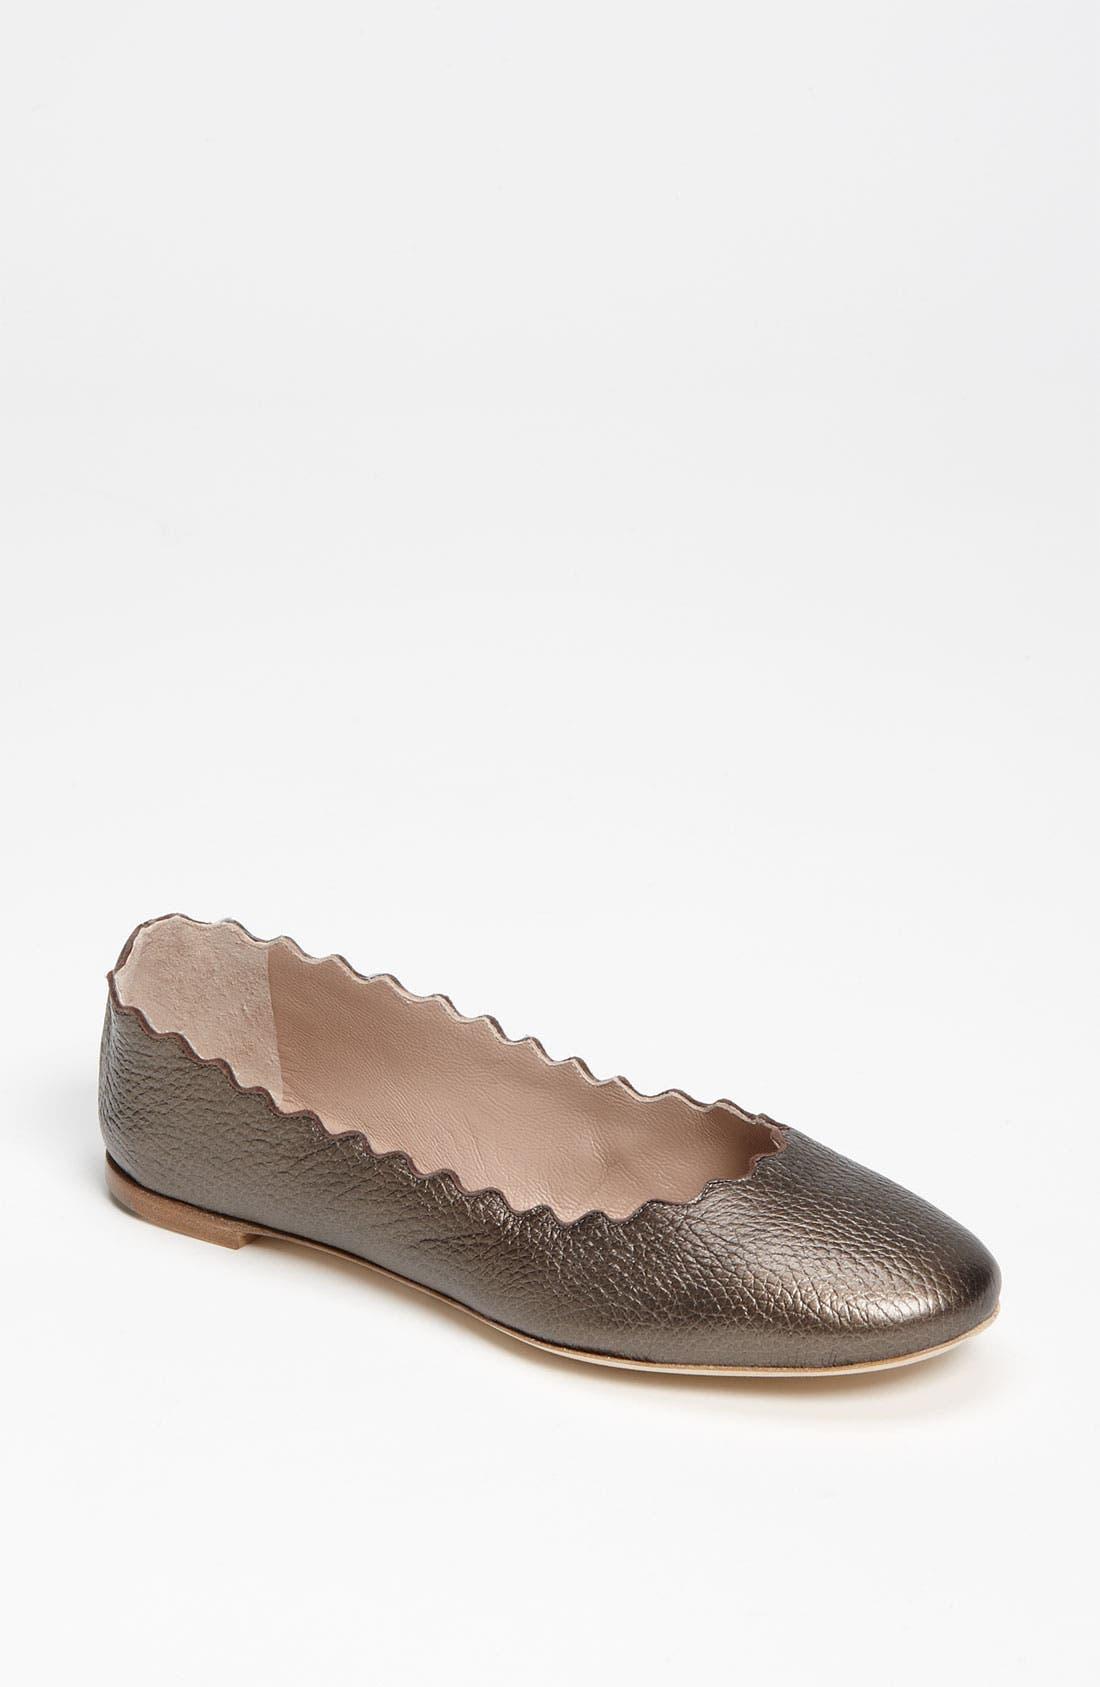 Main Image - Chloé Scalloped Ballet Flat